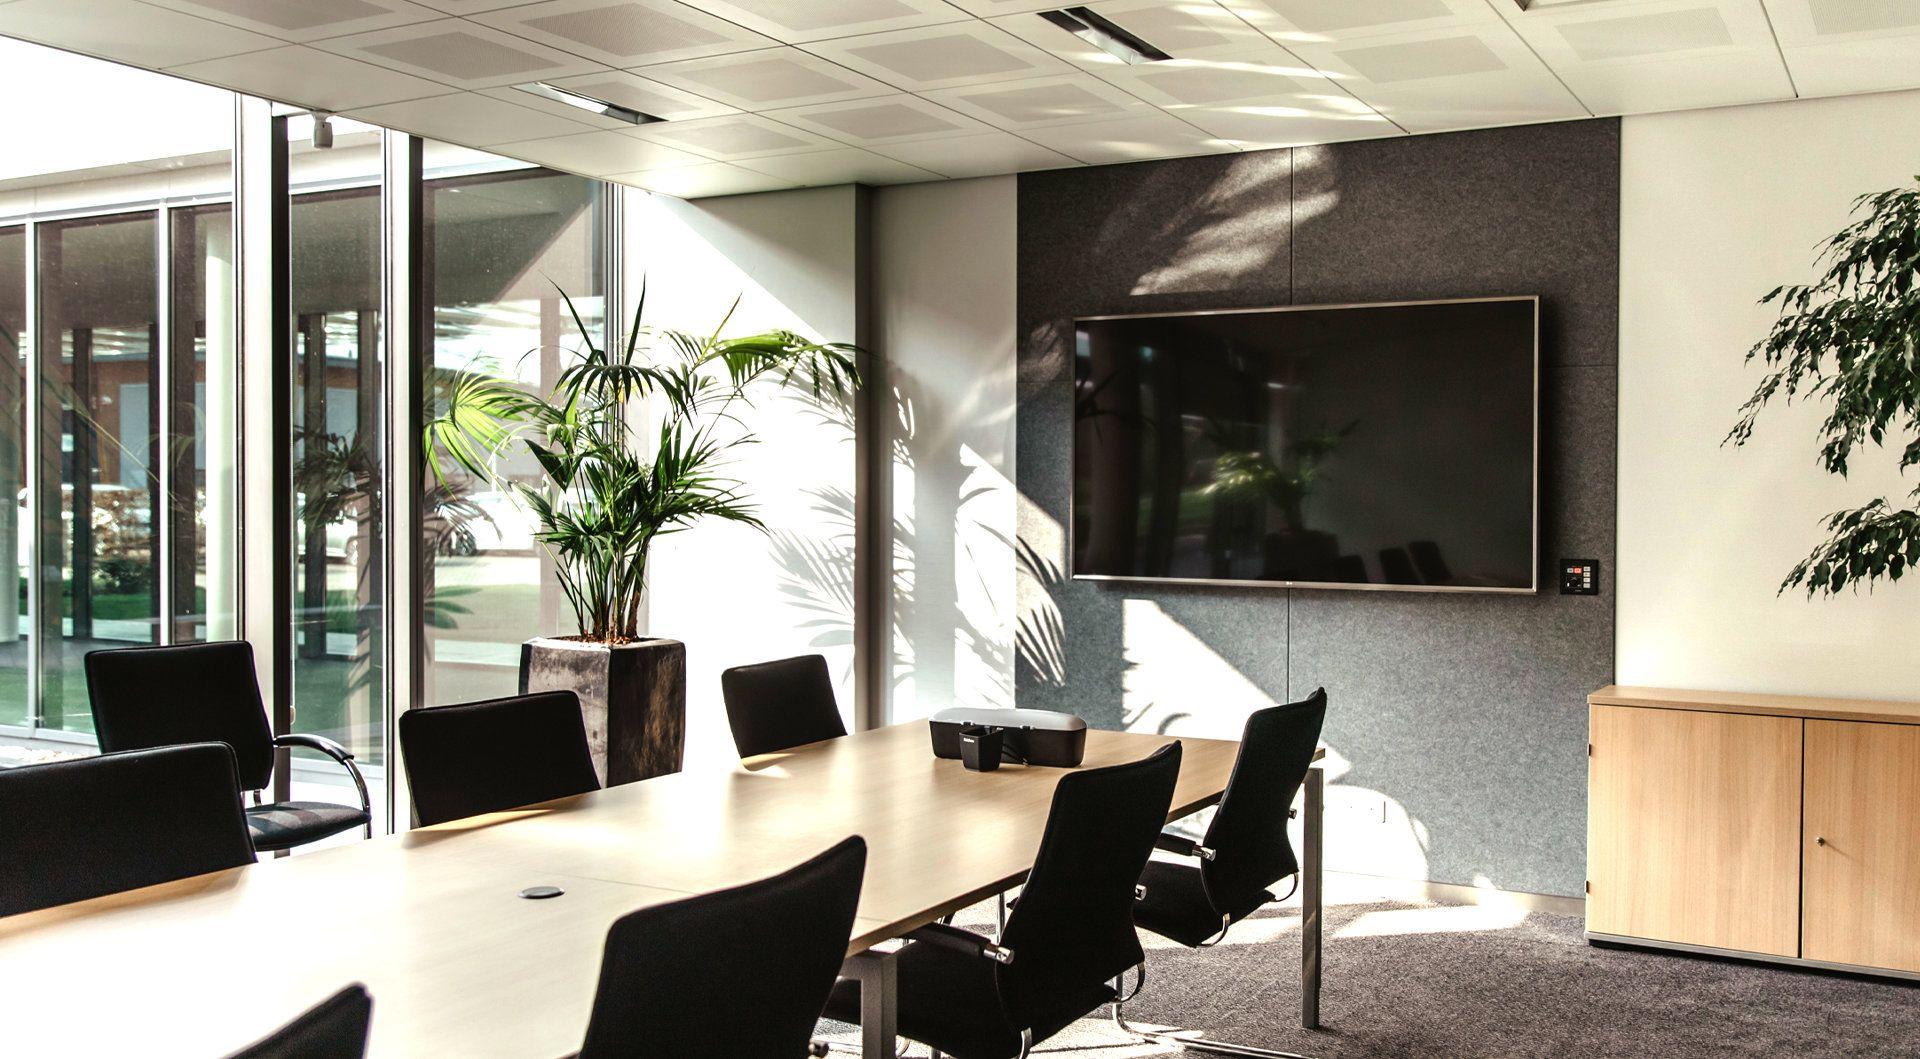 "Benq SL6501 Digitale signage flatscreen 165,1 cm (65"") LED Full HD Zwart - Case studie de vries"